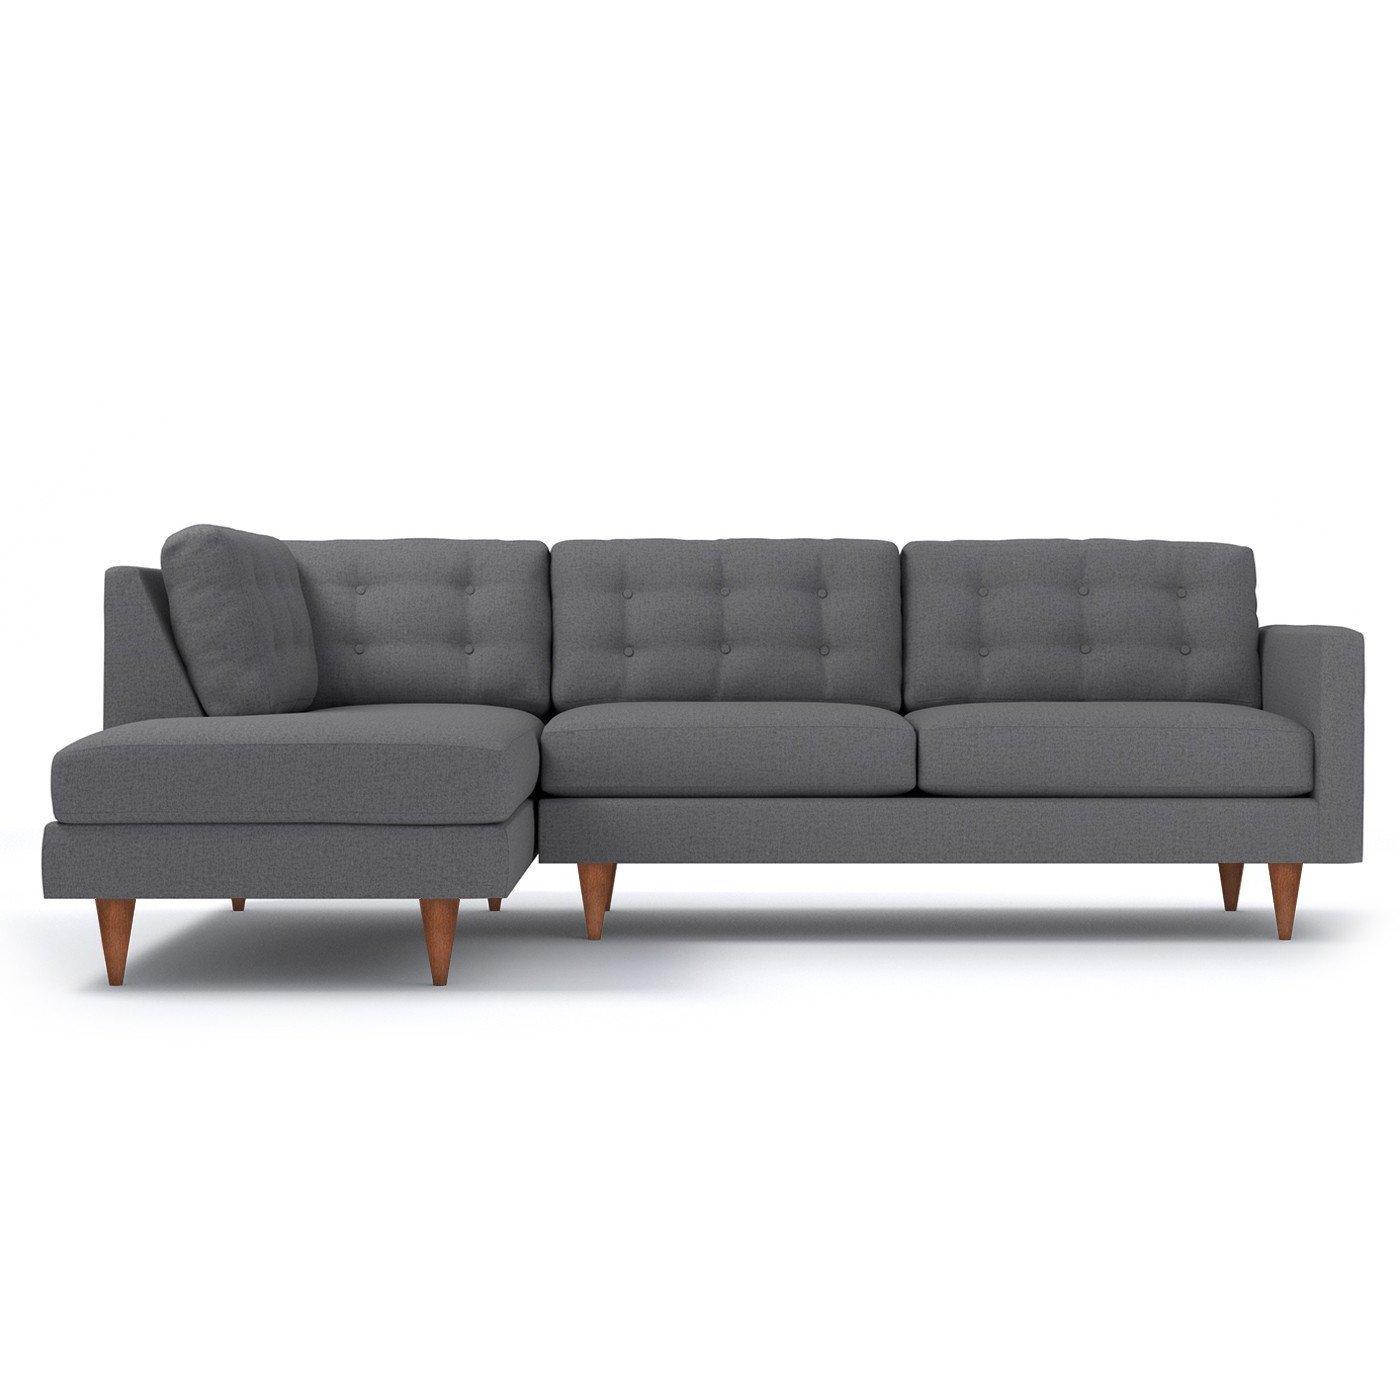 Amazon.com: Apt2B Logan 2pc Sectional Sofa, LAF - Left Arm Facing ...